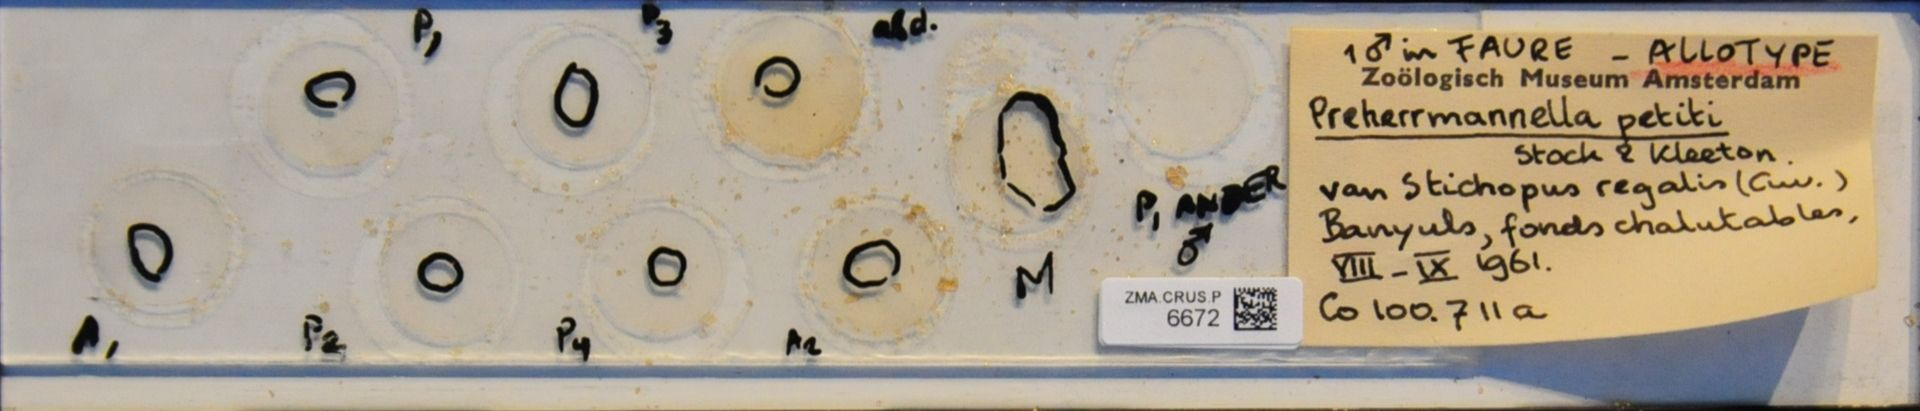 ZMA.CRUS.P.6672 | Preherrmannella petiti Stock & Kleeton